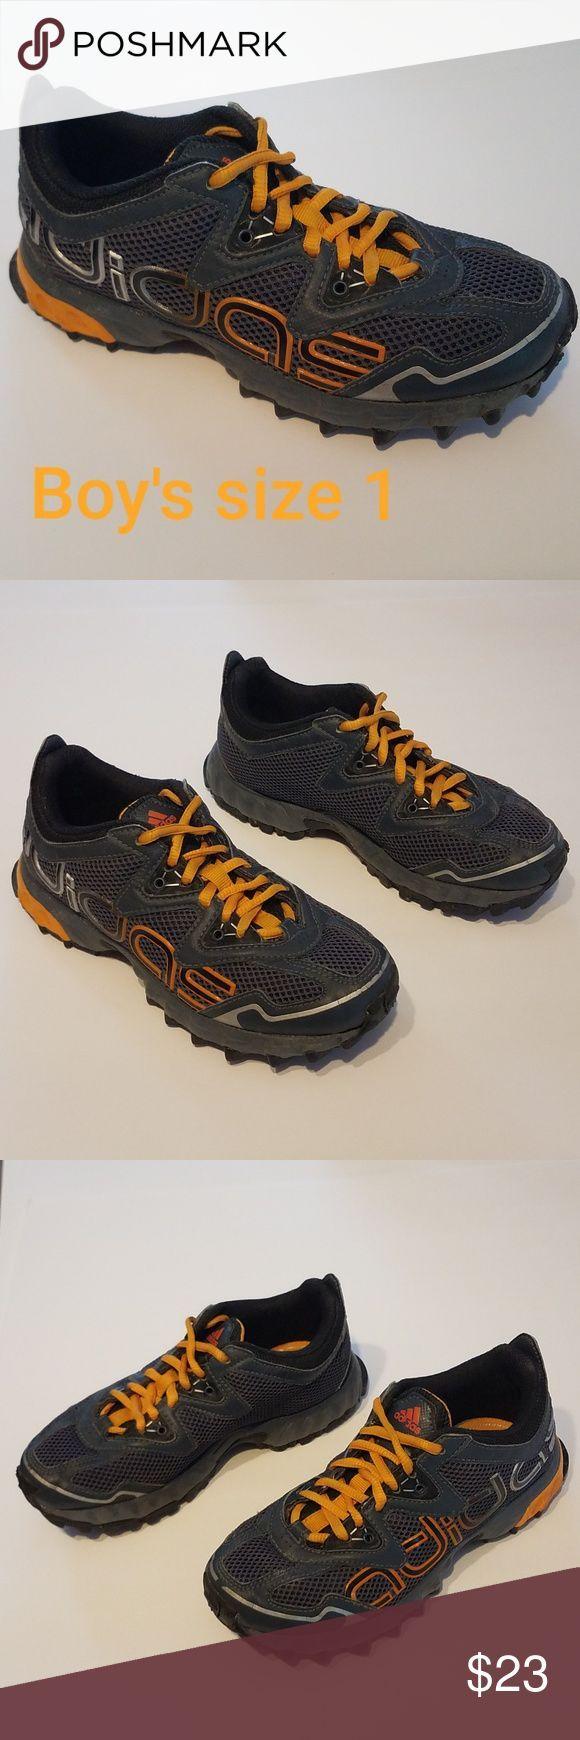 Trail running shoes, Adidas trail